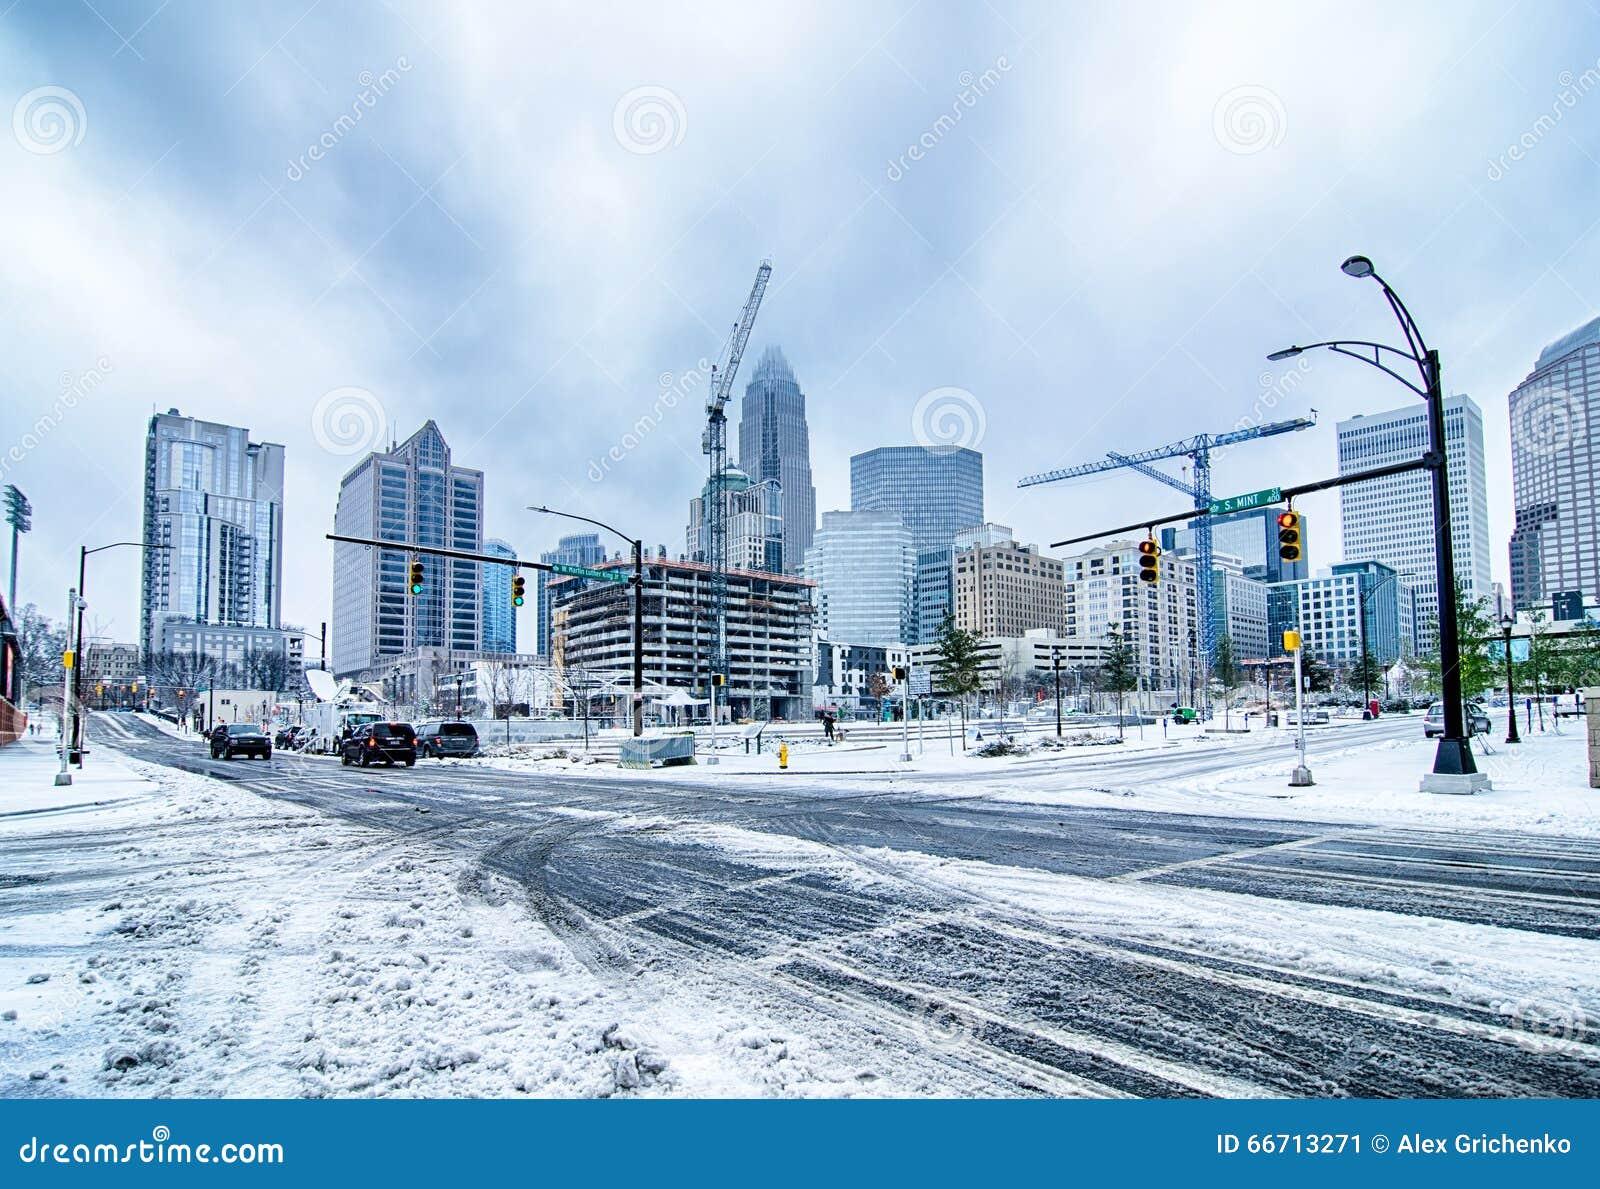 Rare Winter Weather In Charlotte North Carolina Stock Image Image